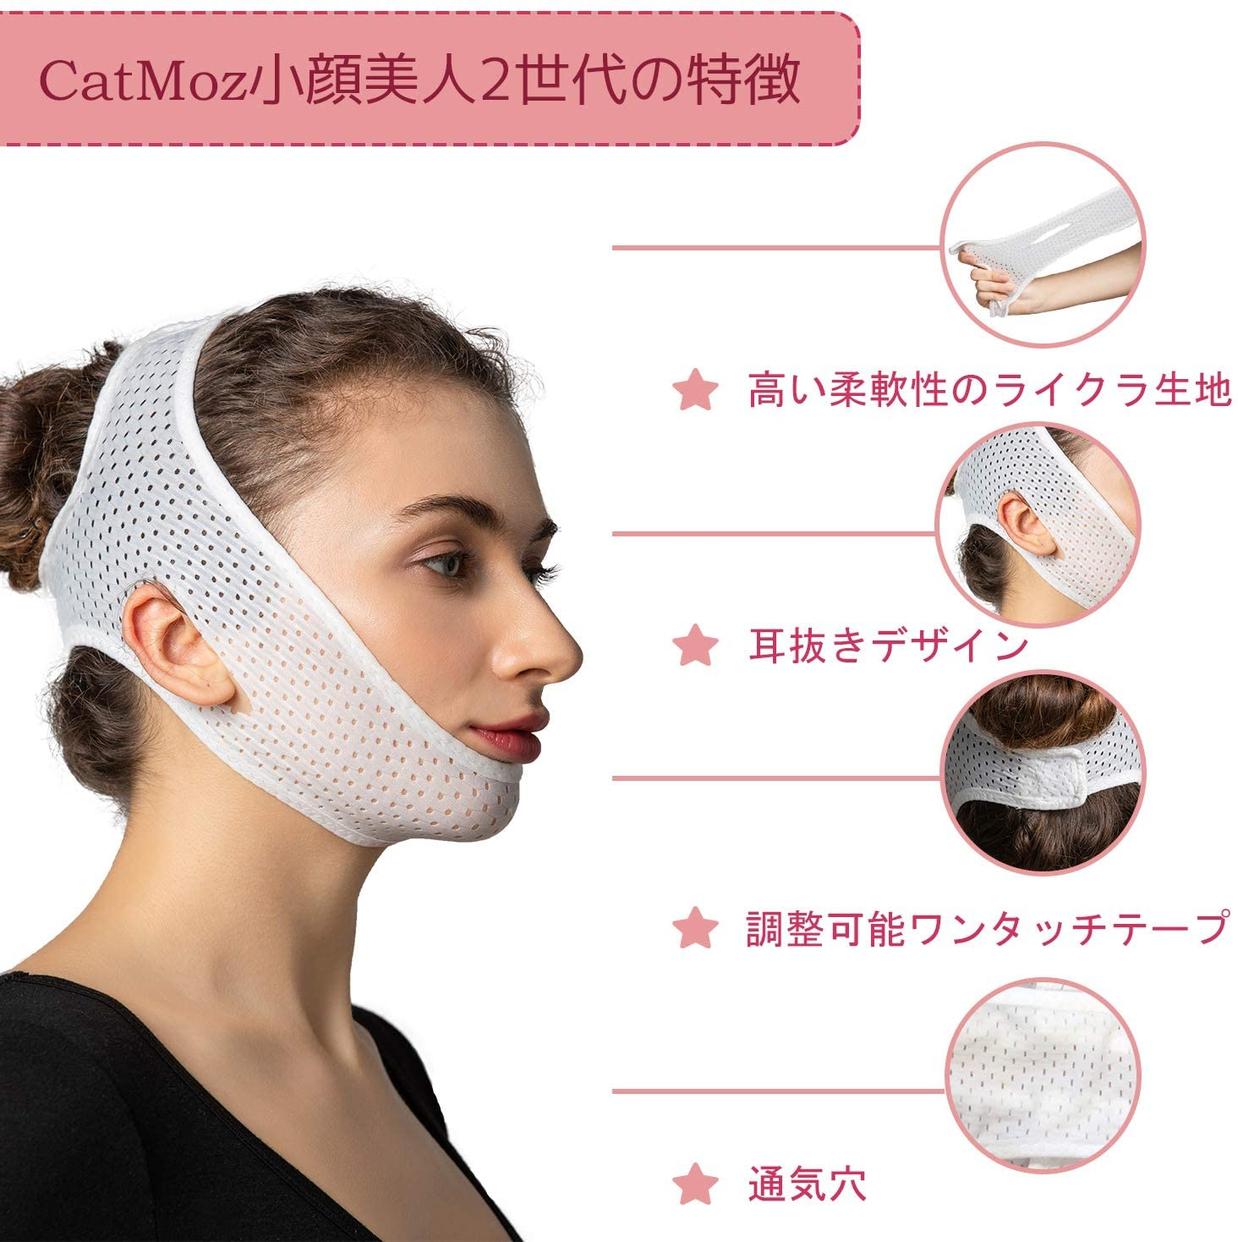 CatMoz(キャットモズ) 小顔美人第2世リフトアップベルト 101010-0000の商品画像2